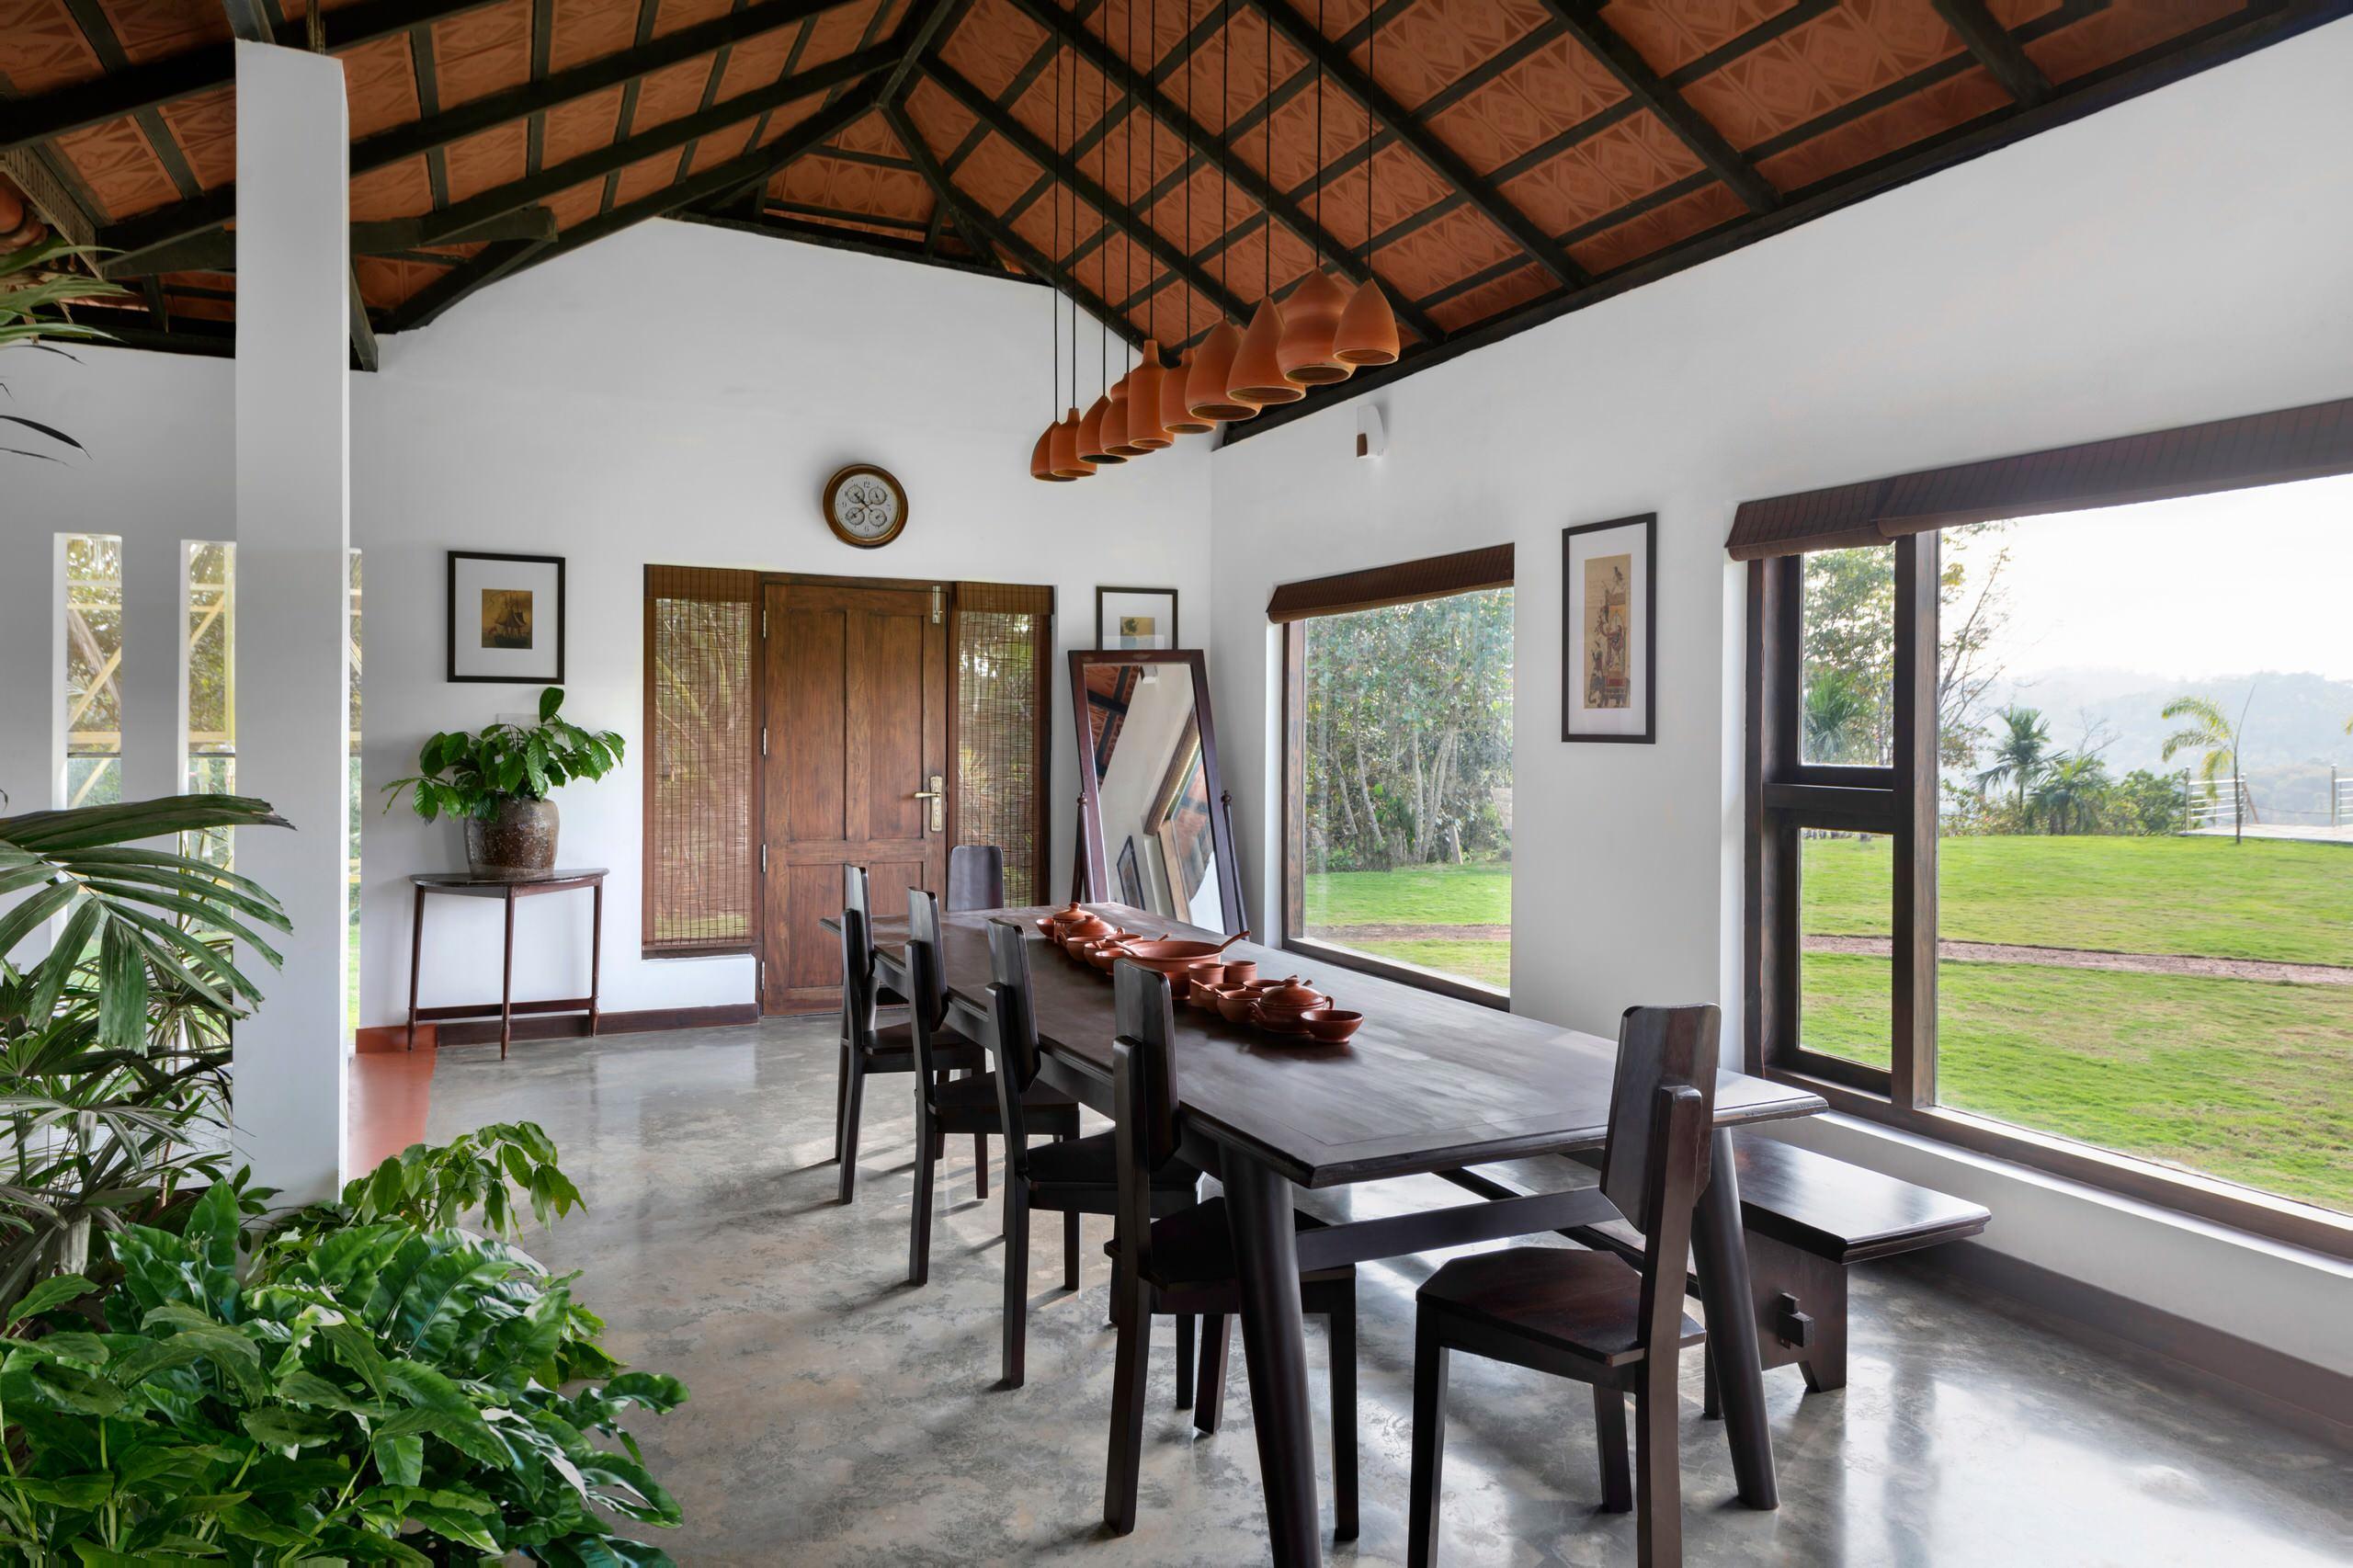 Kerala Dining Room Ideas Photos Houzz